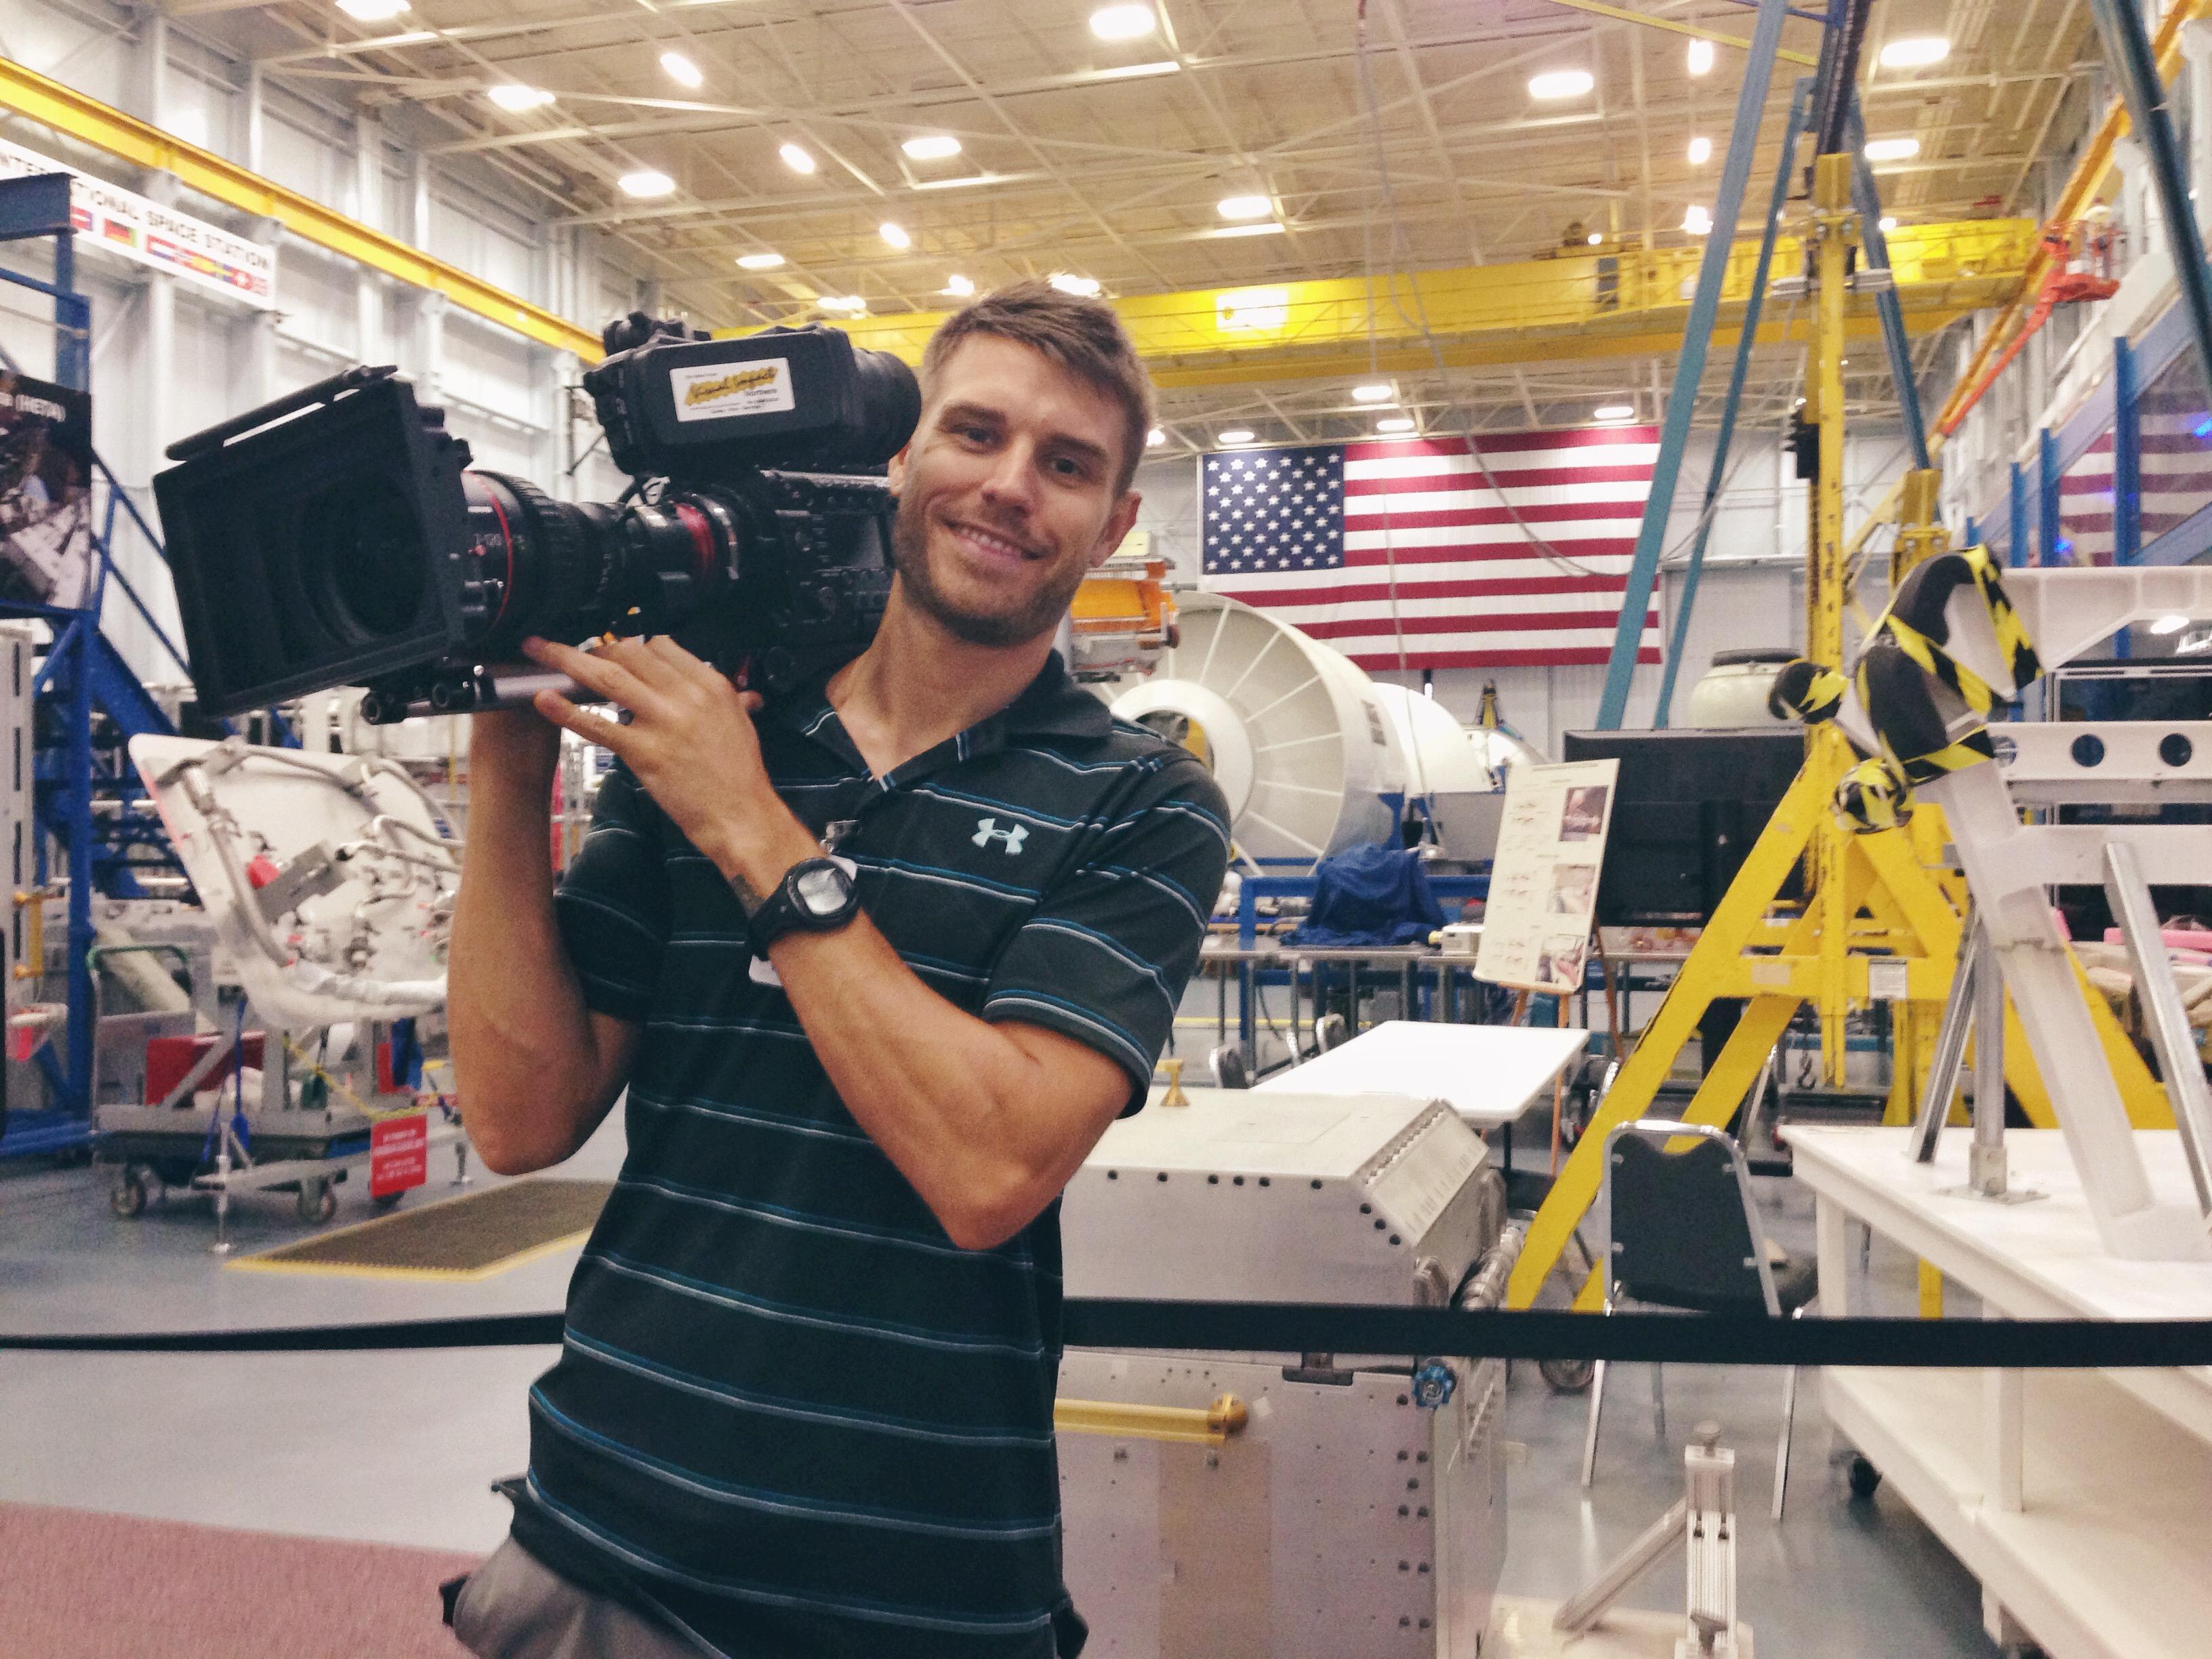 IMG 09381 Houston Crew Goes to Mars Yard at NASA